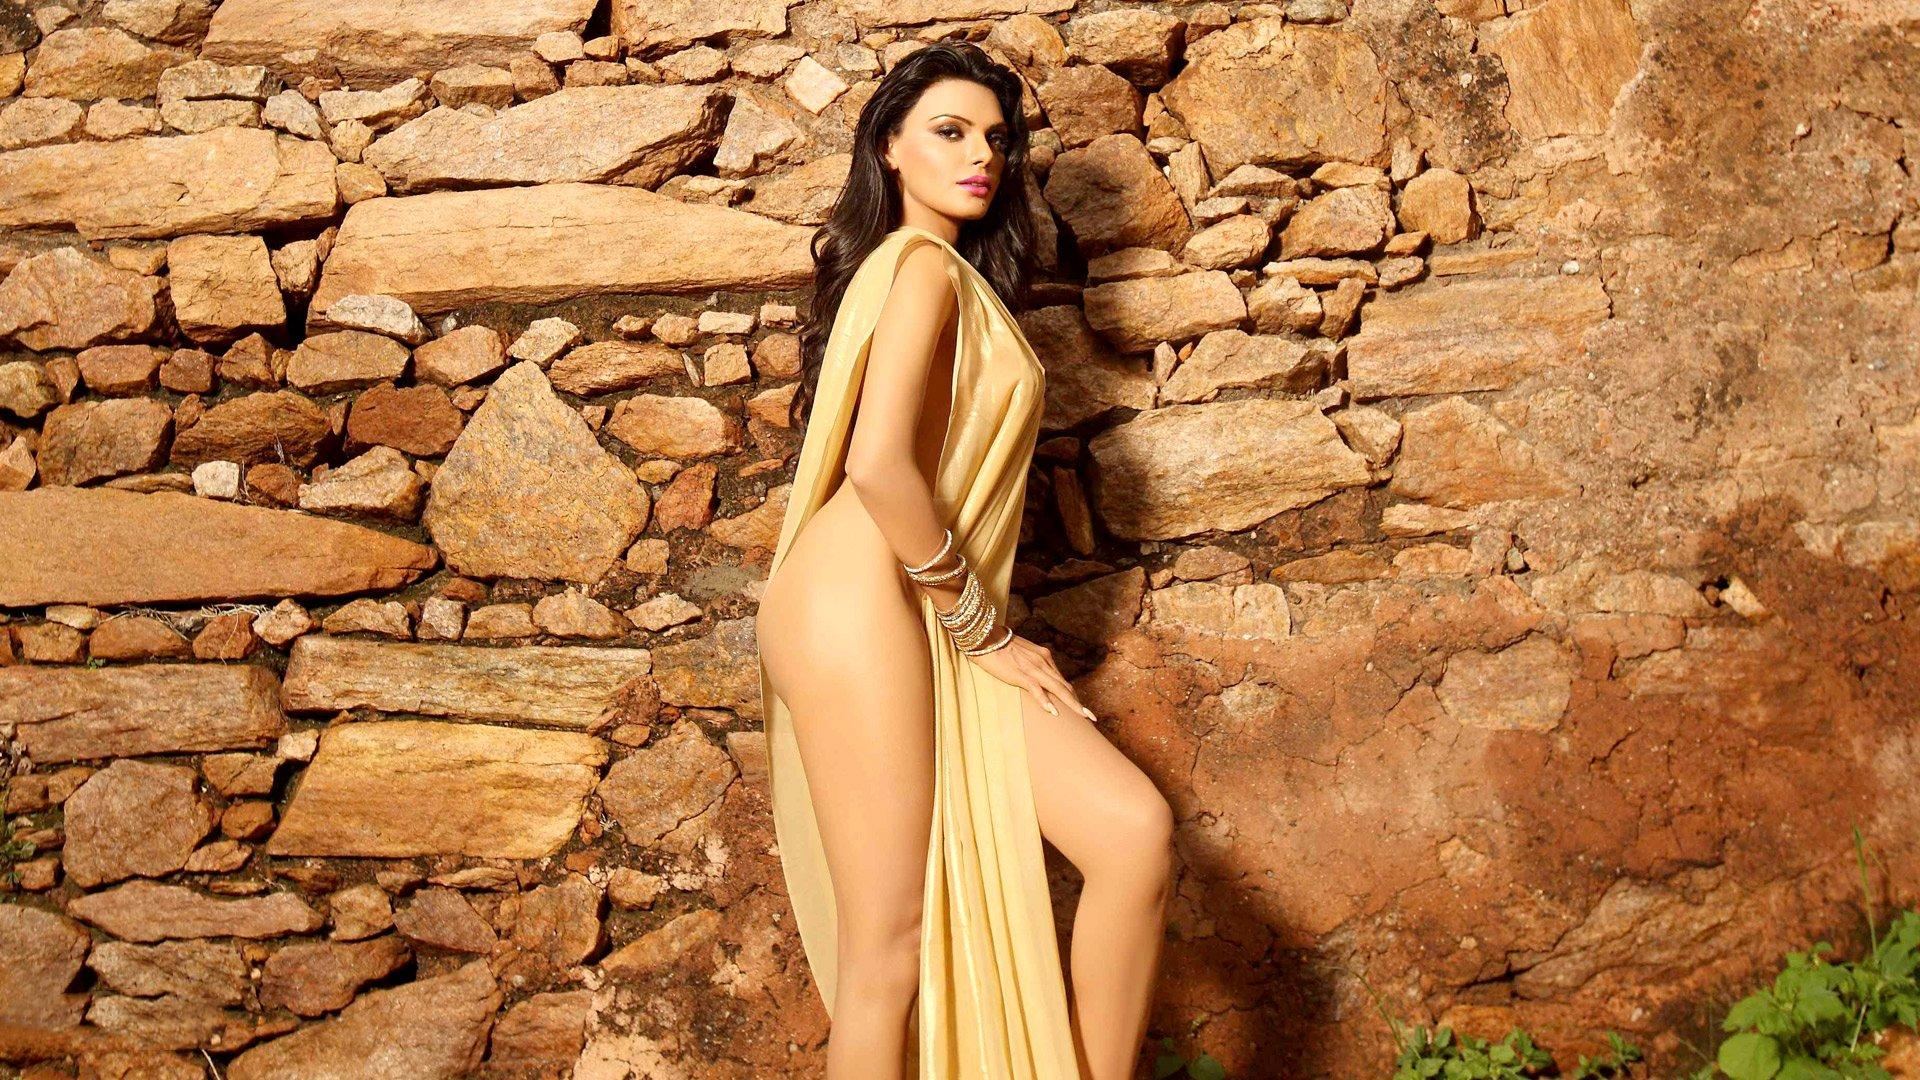 Priyanka chopra nude, topless pictures, playboy photos, sex scene uncensored